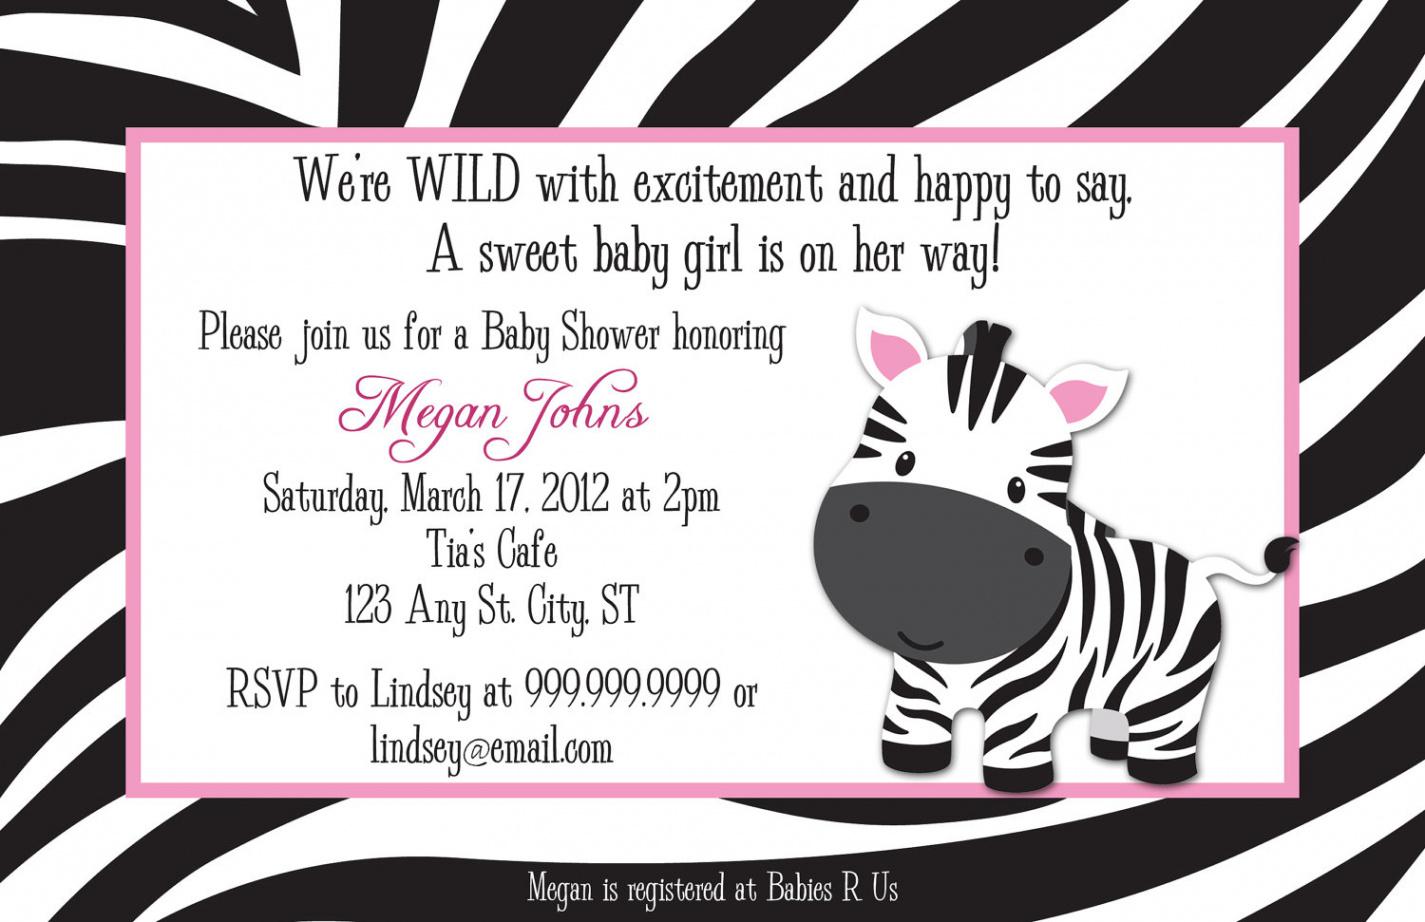 Creative Free Printable Animal Print Birthday Invitations - Free Printable Animal Print Birthday Invitations